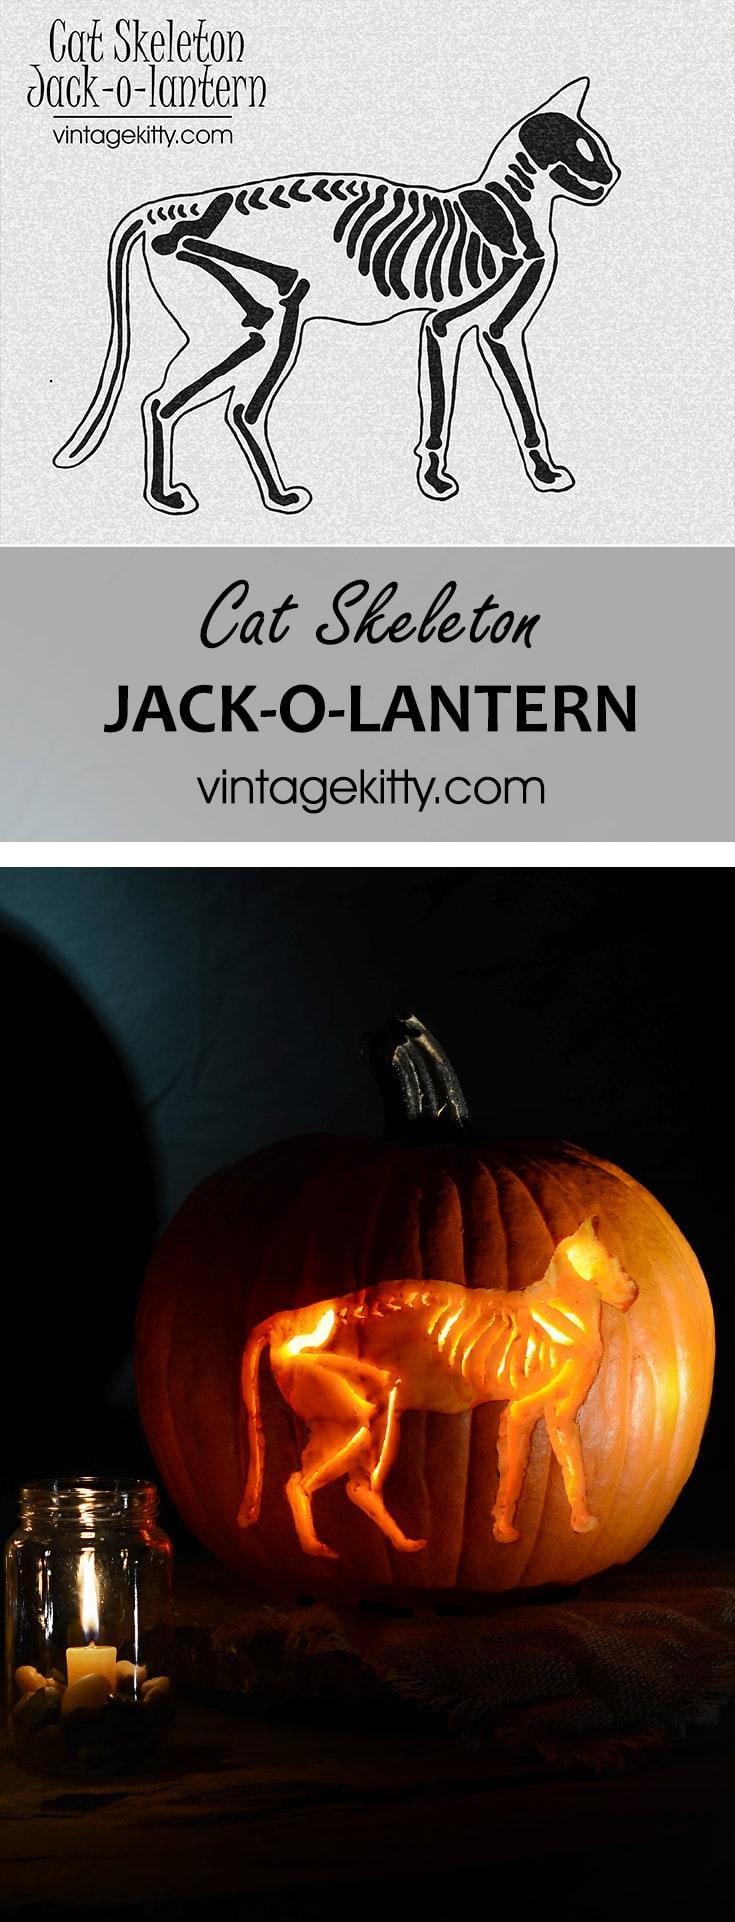 Skeleton Cat Pin - Skeleton Cat Printable </br>Pumpkin Carving Pattern